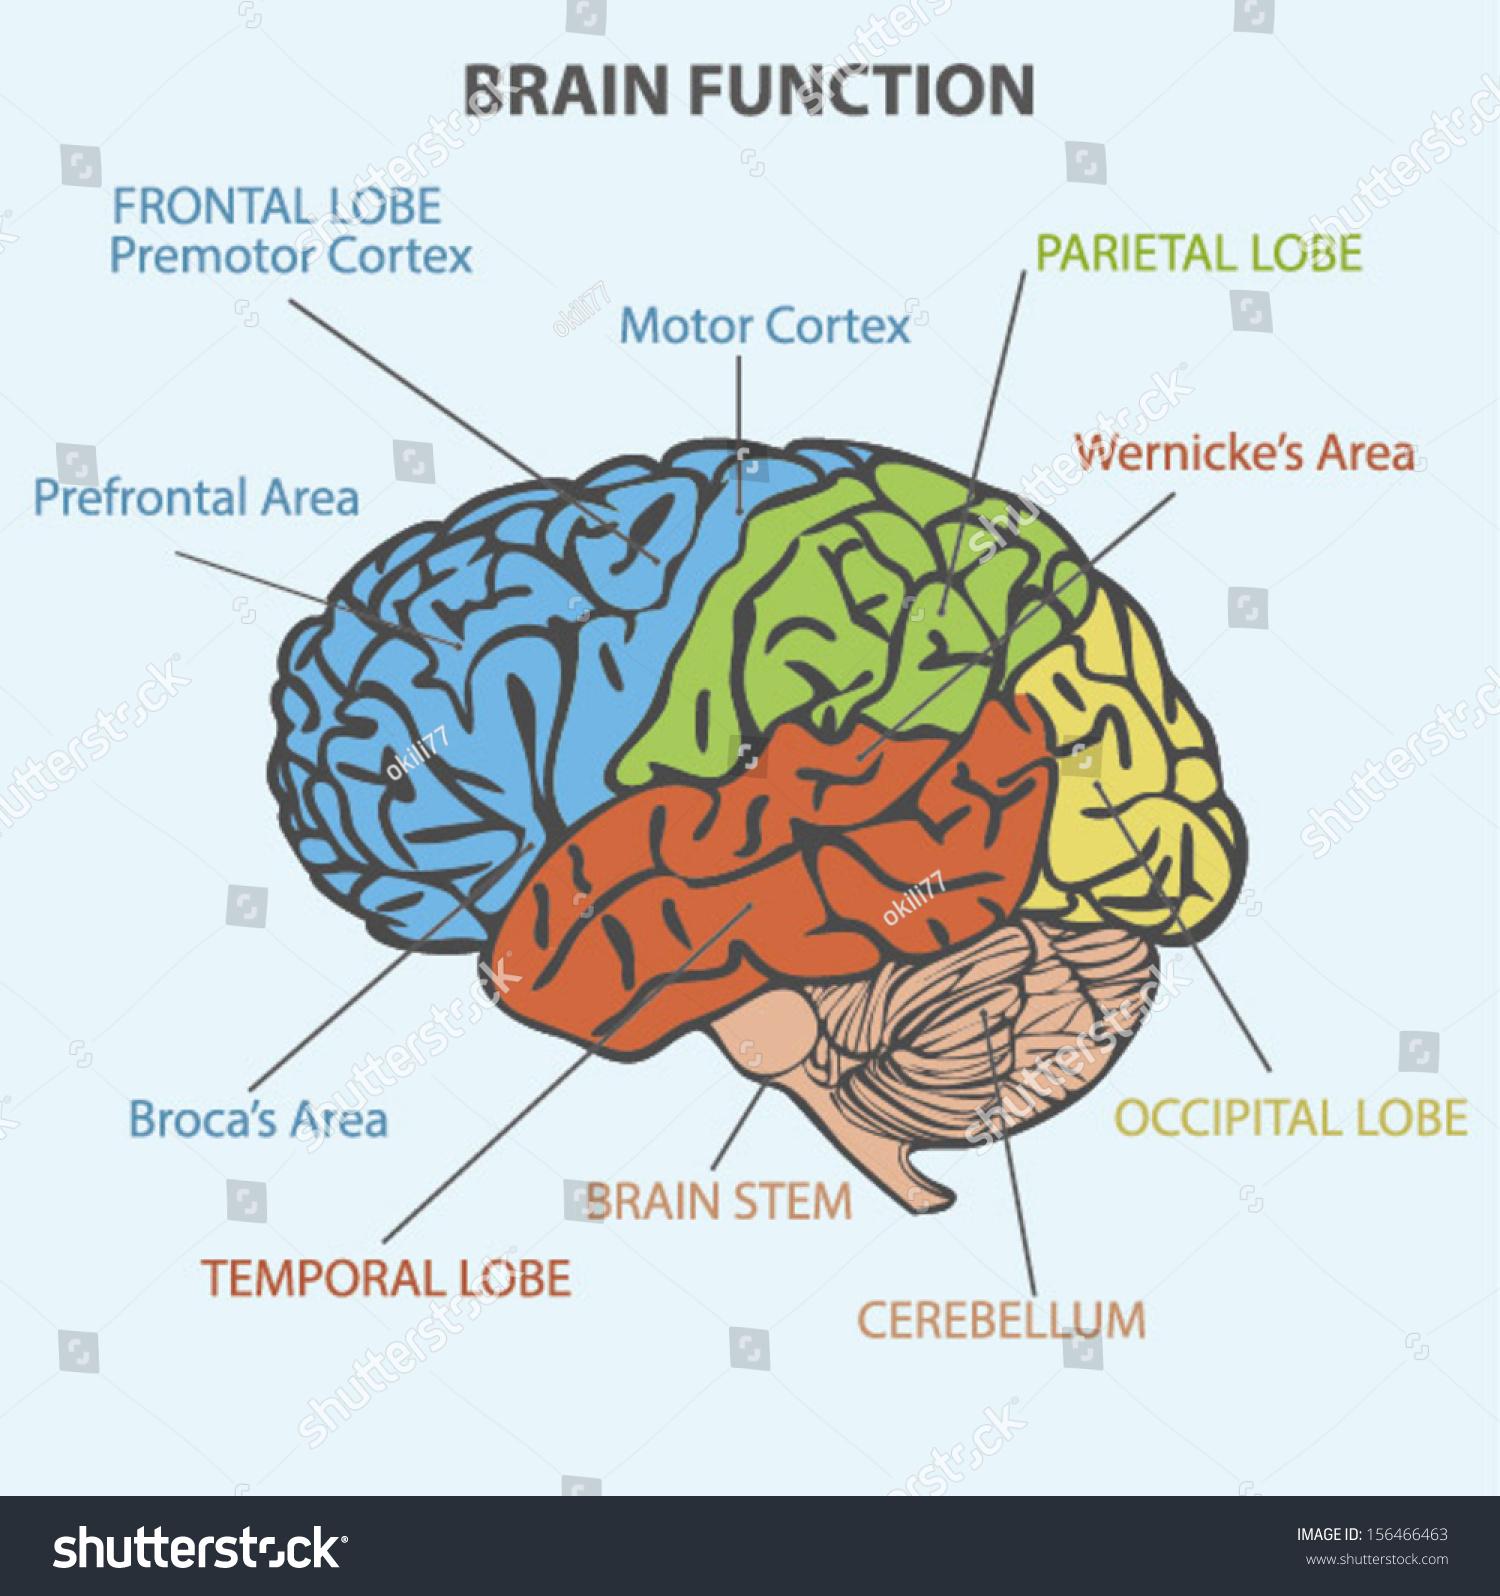 Brain Functions Diagram Motor - DIY Enthusiasts Wiring Diagrams •